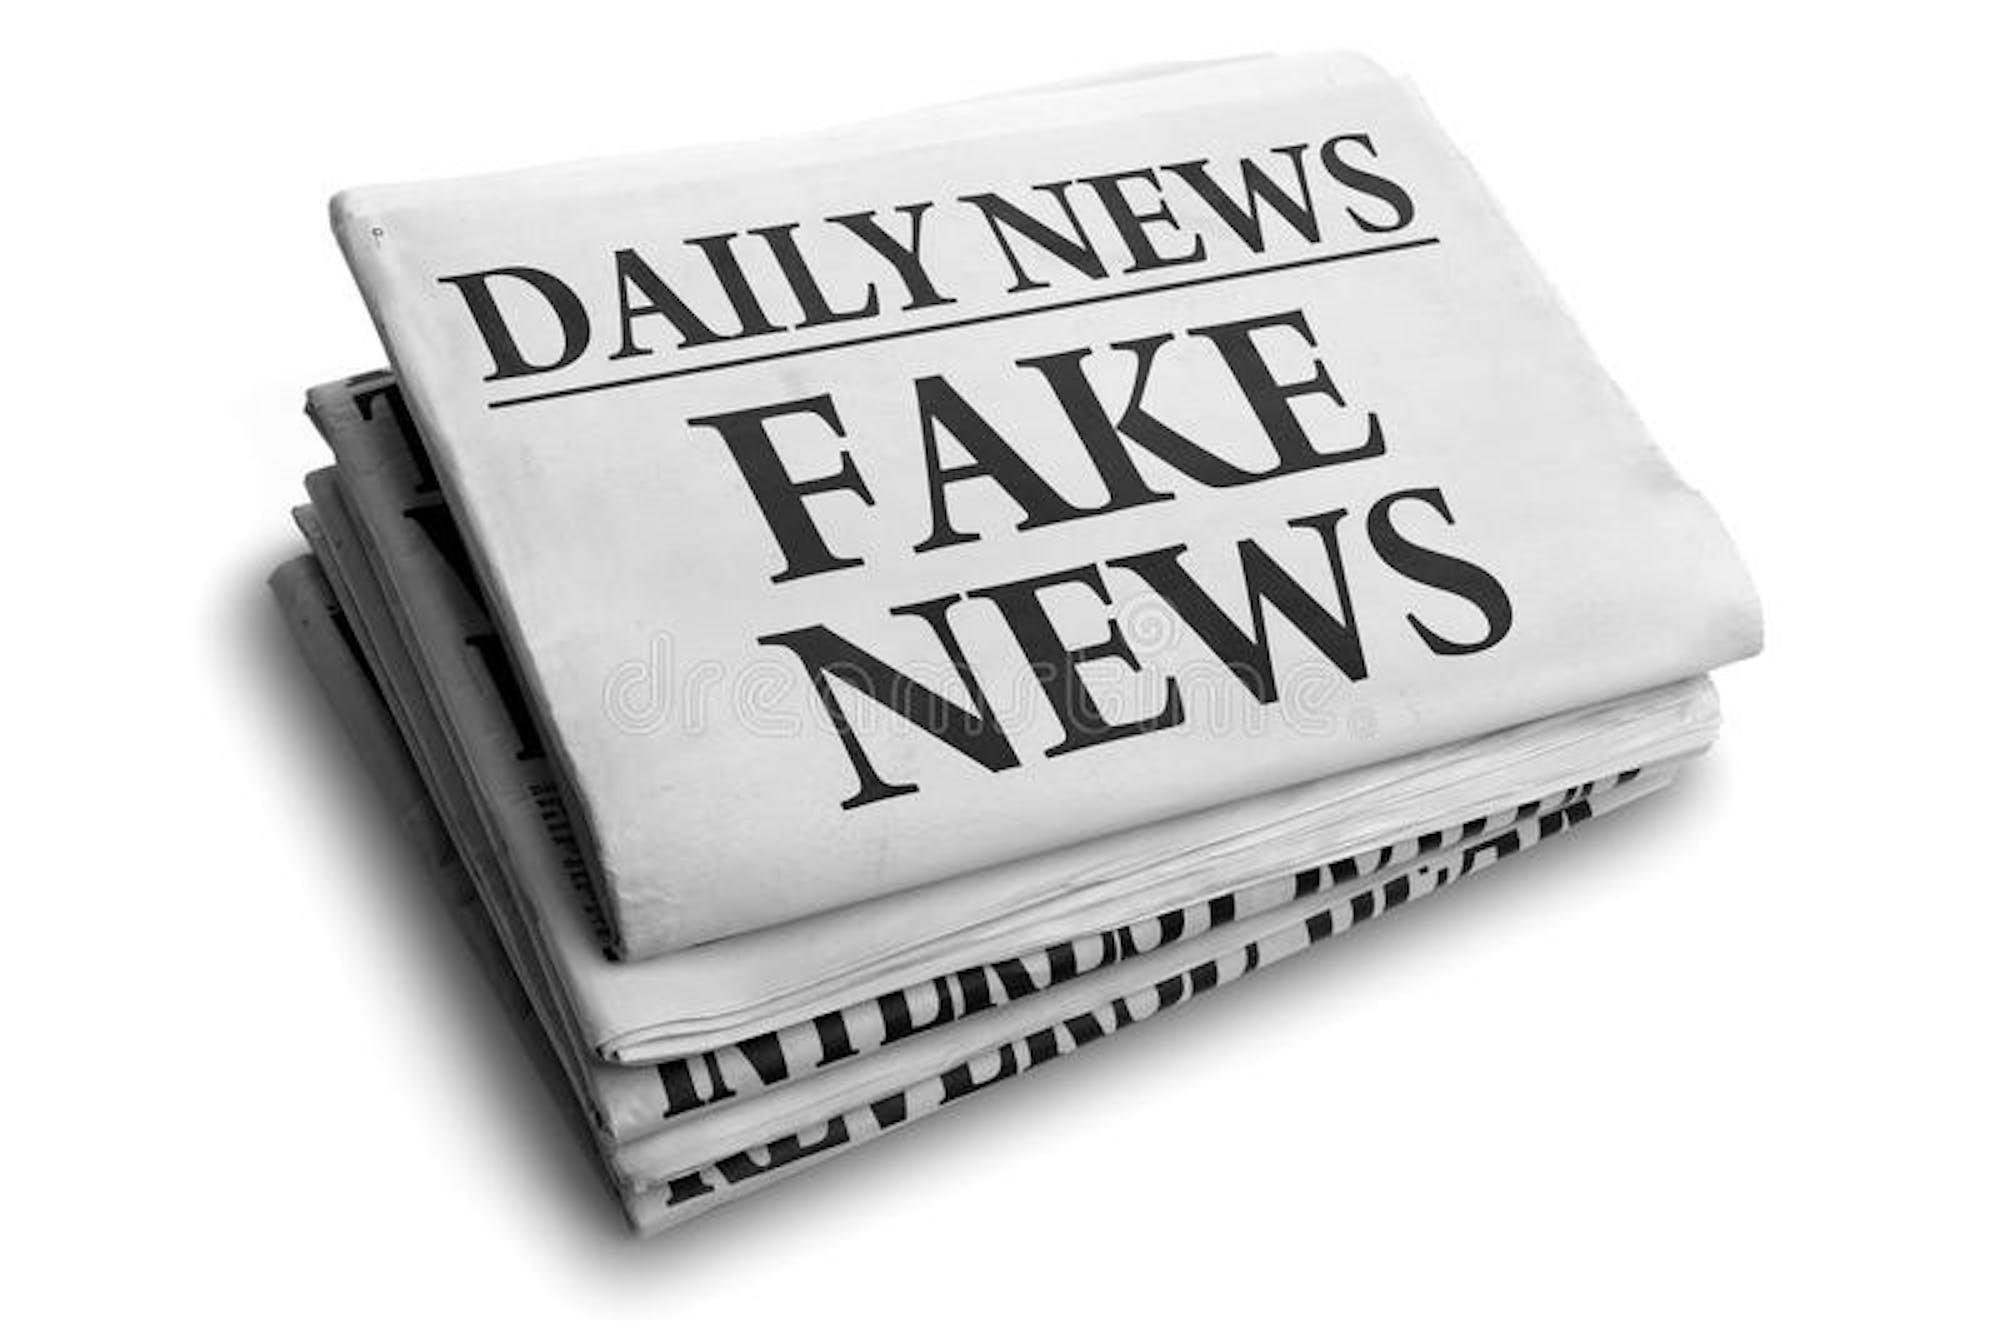 news-newspaper-headline-reading-fake-news-concept-false-event-news-headline-fake-news-newspaper-headline-108454601